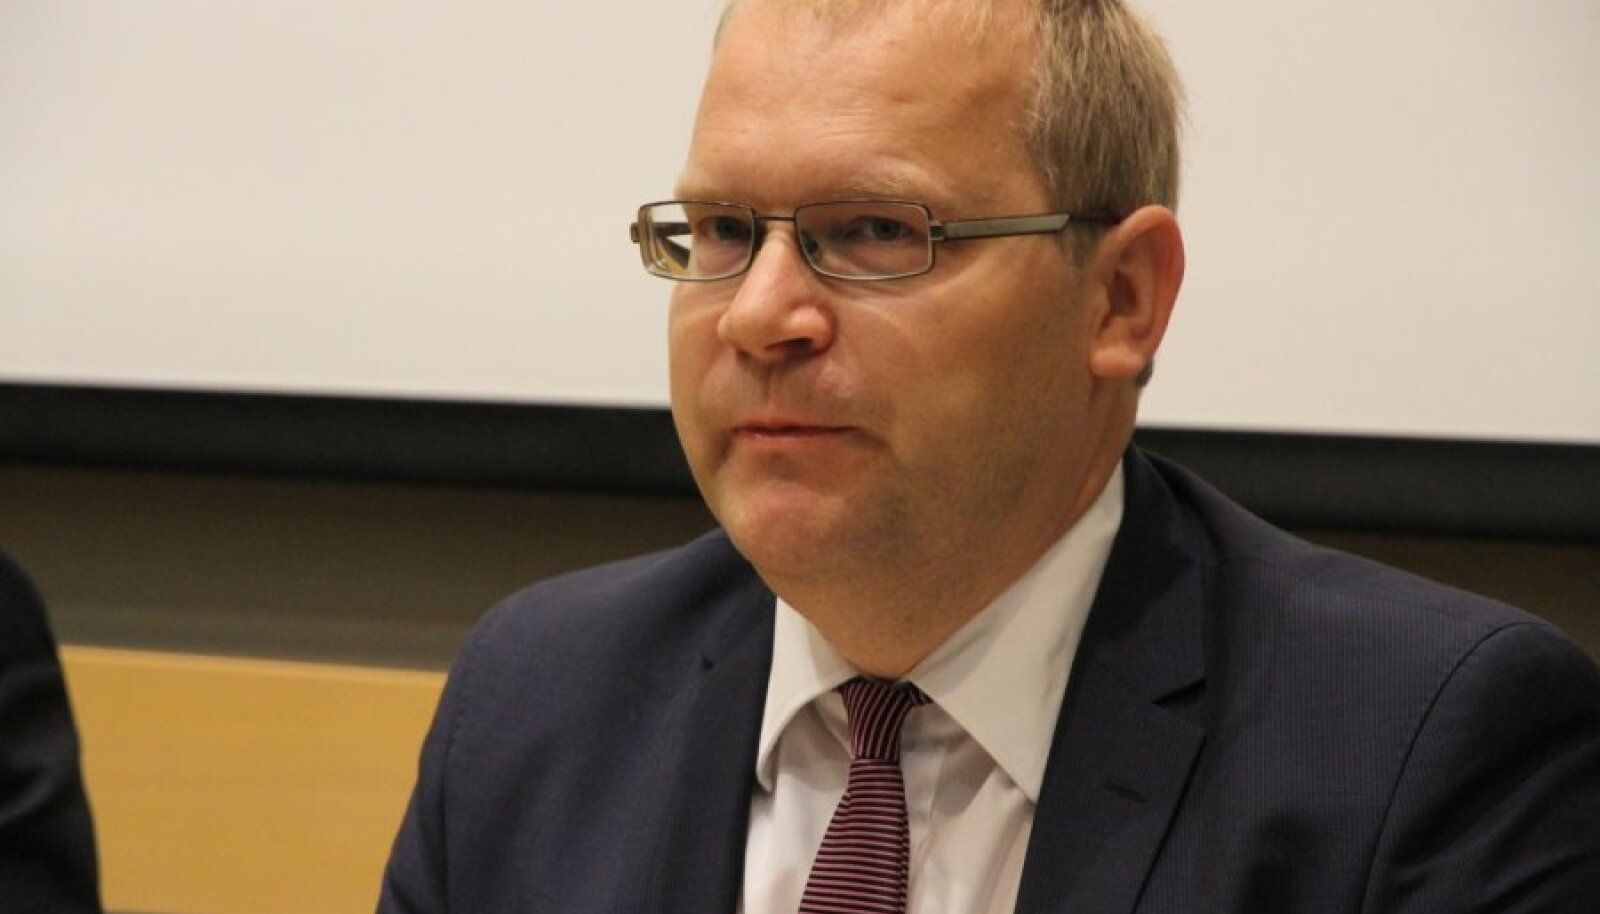 Välisministeeriumi istung 17.06.2014